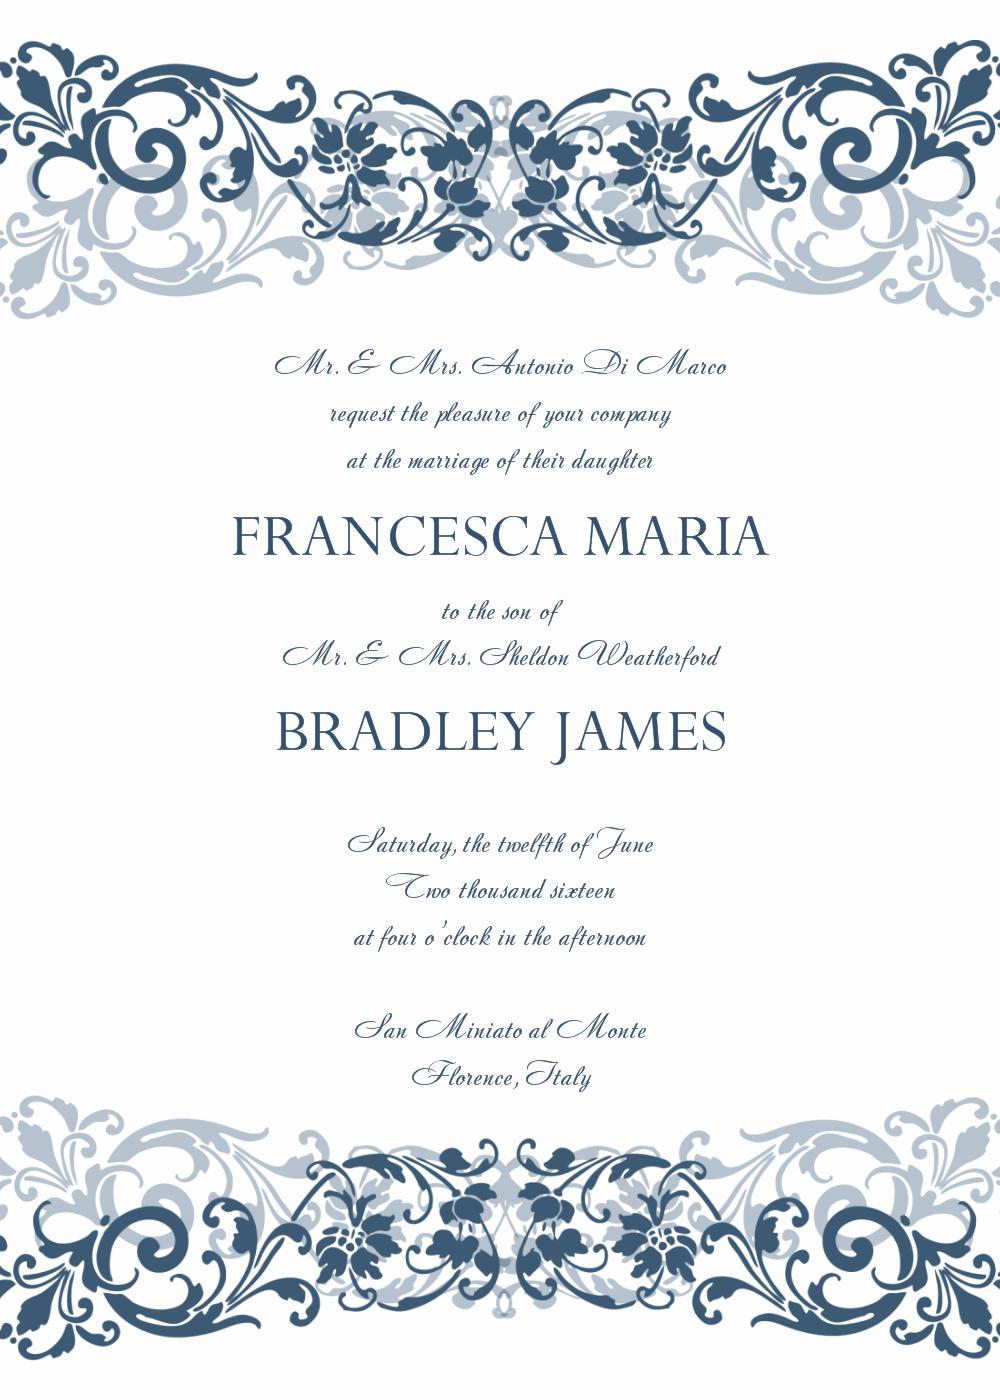 Word Invitation Template Free Elegant 30 Free Wedding Invitations Templates